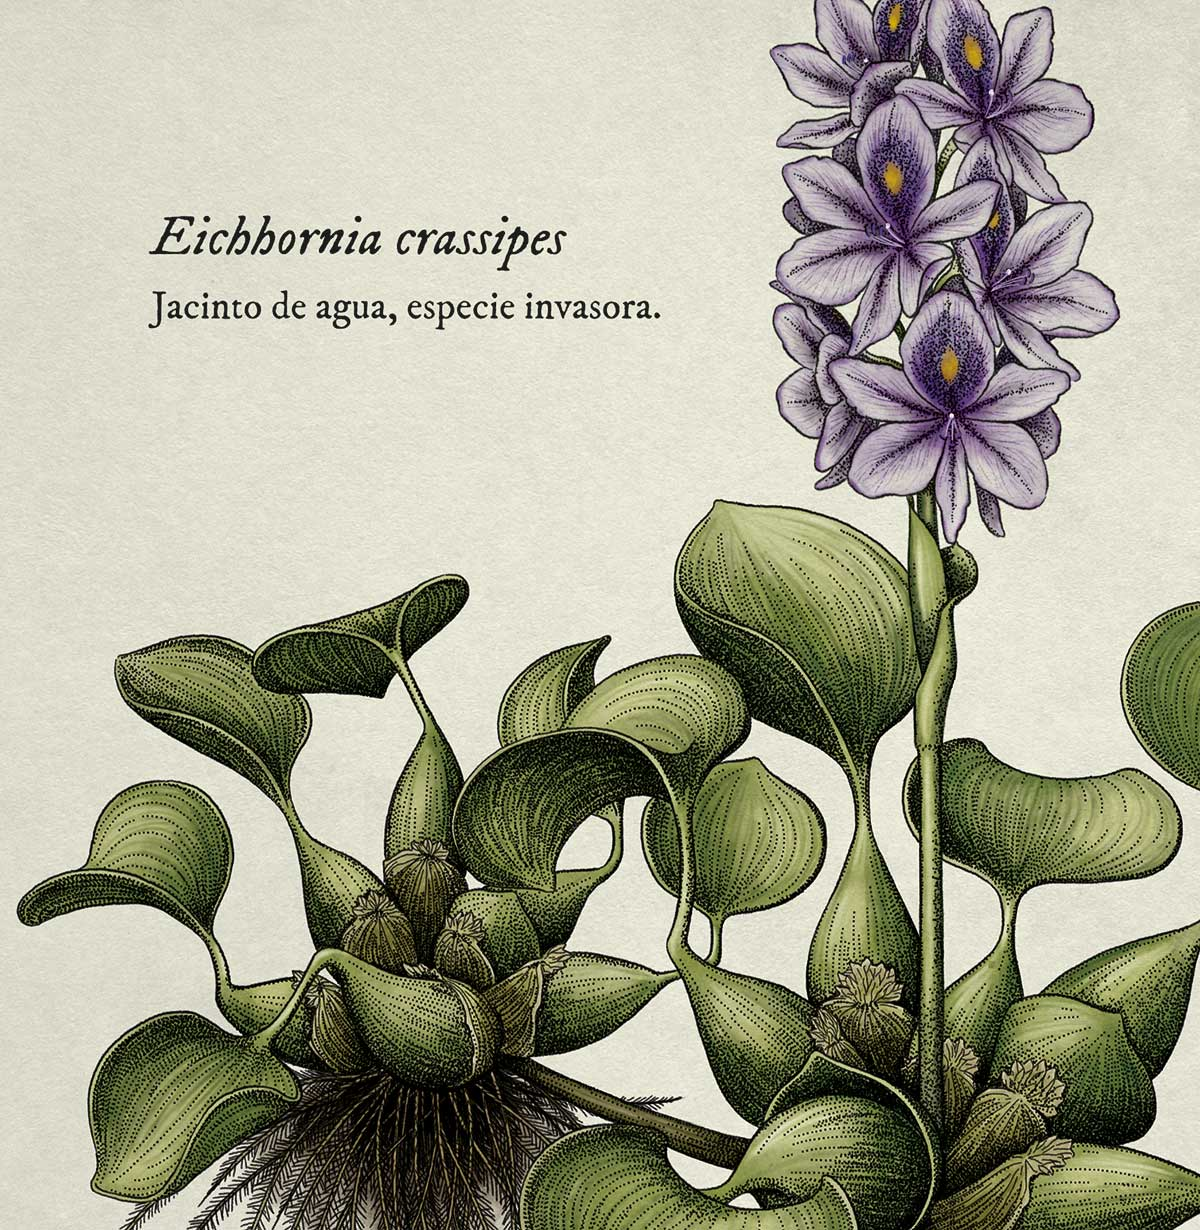 Eichhornia_crassipes_jacintodeagua_Isaloureiro_2